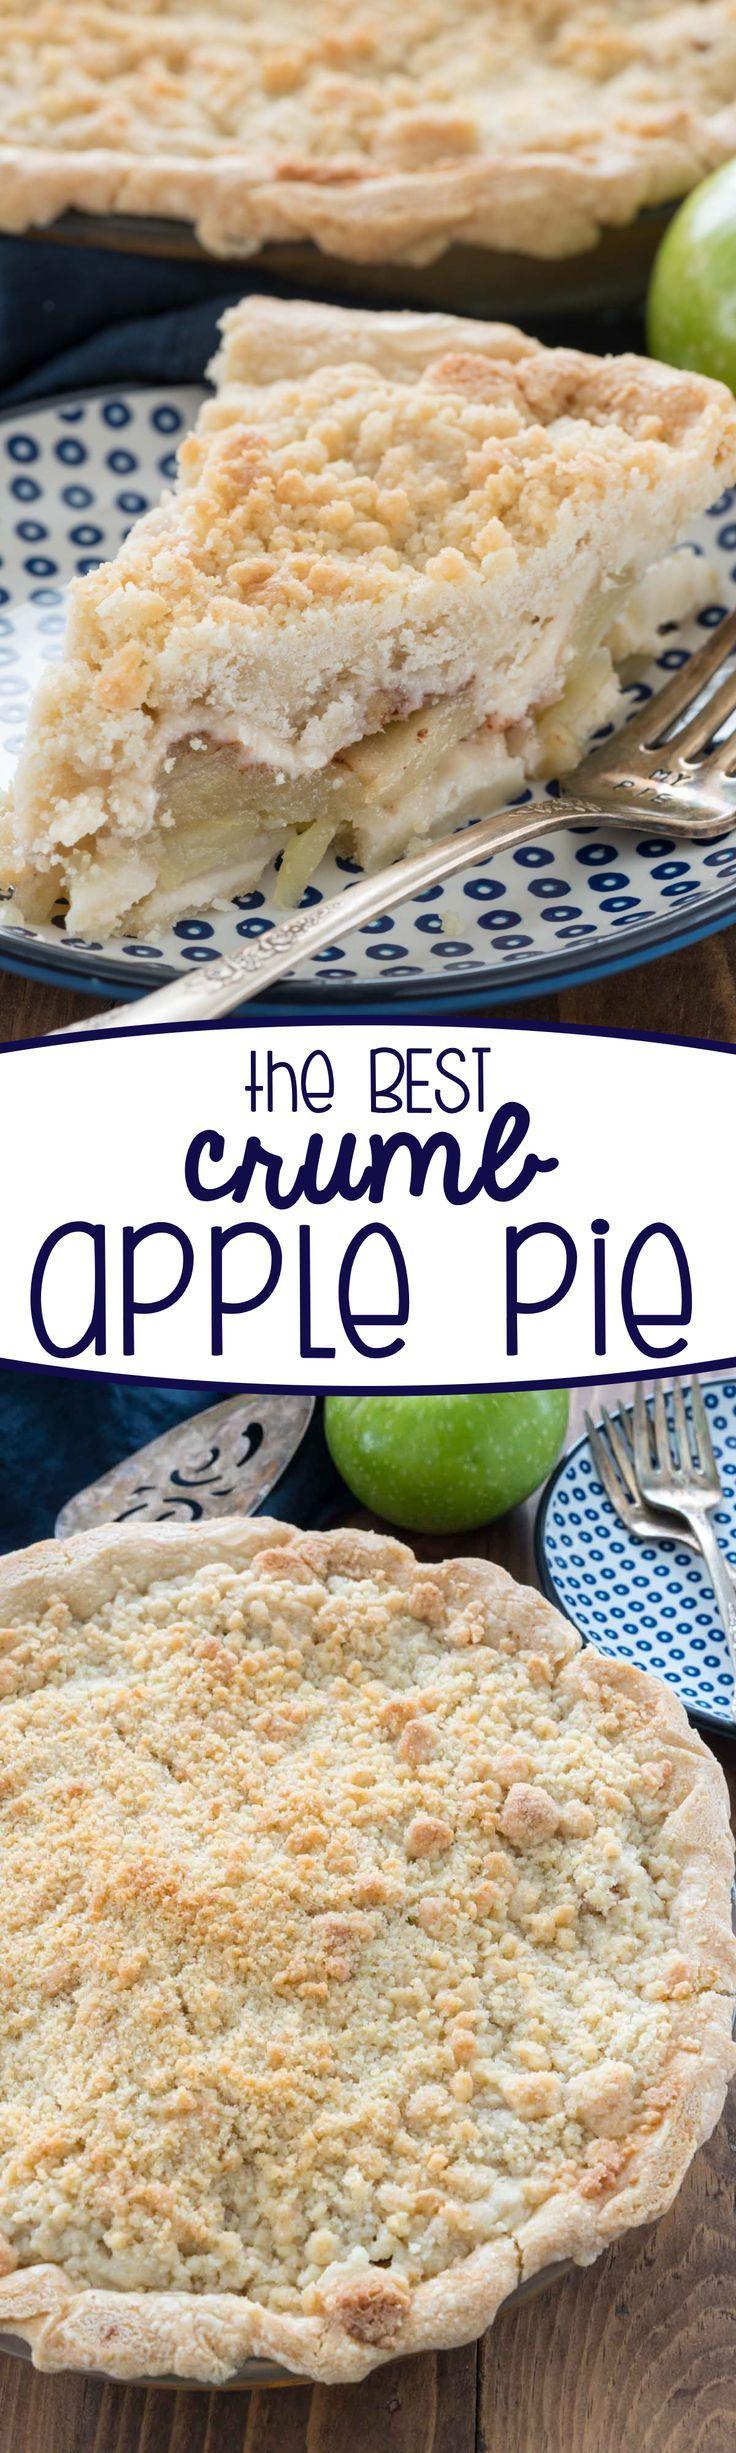 Homemade Apple Pie Recipe - YouTube